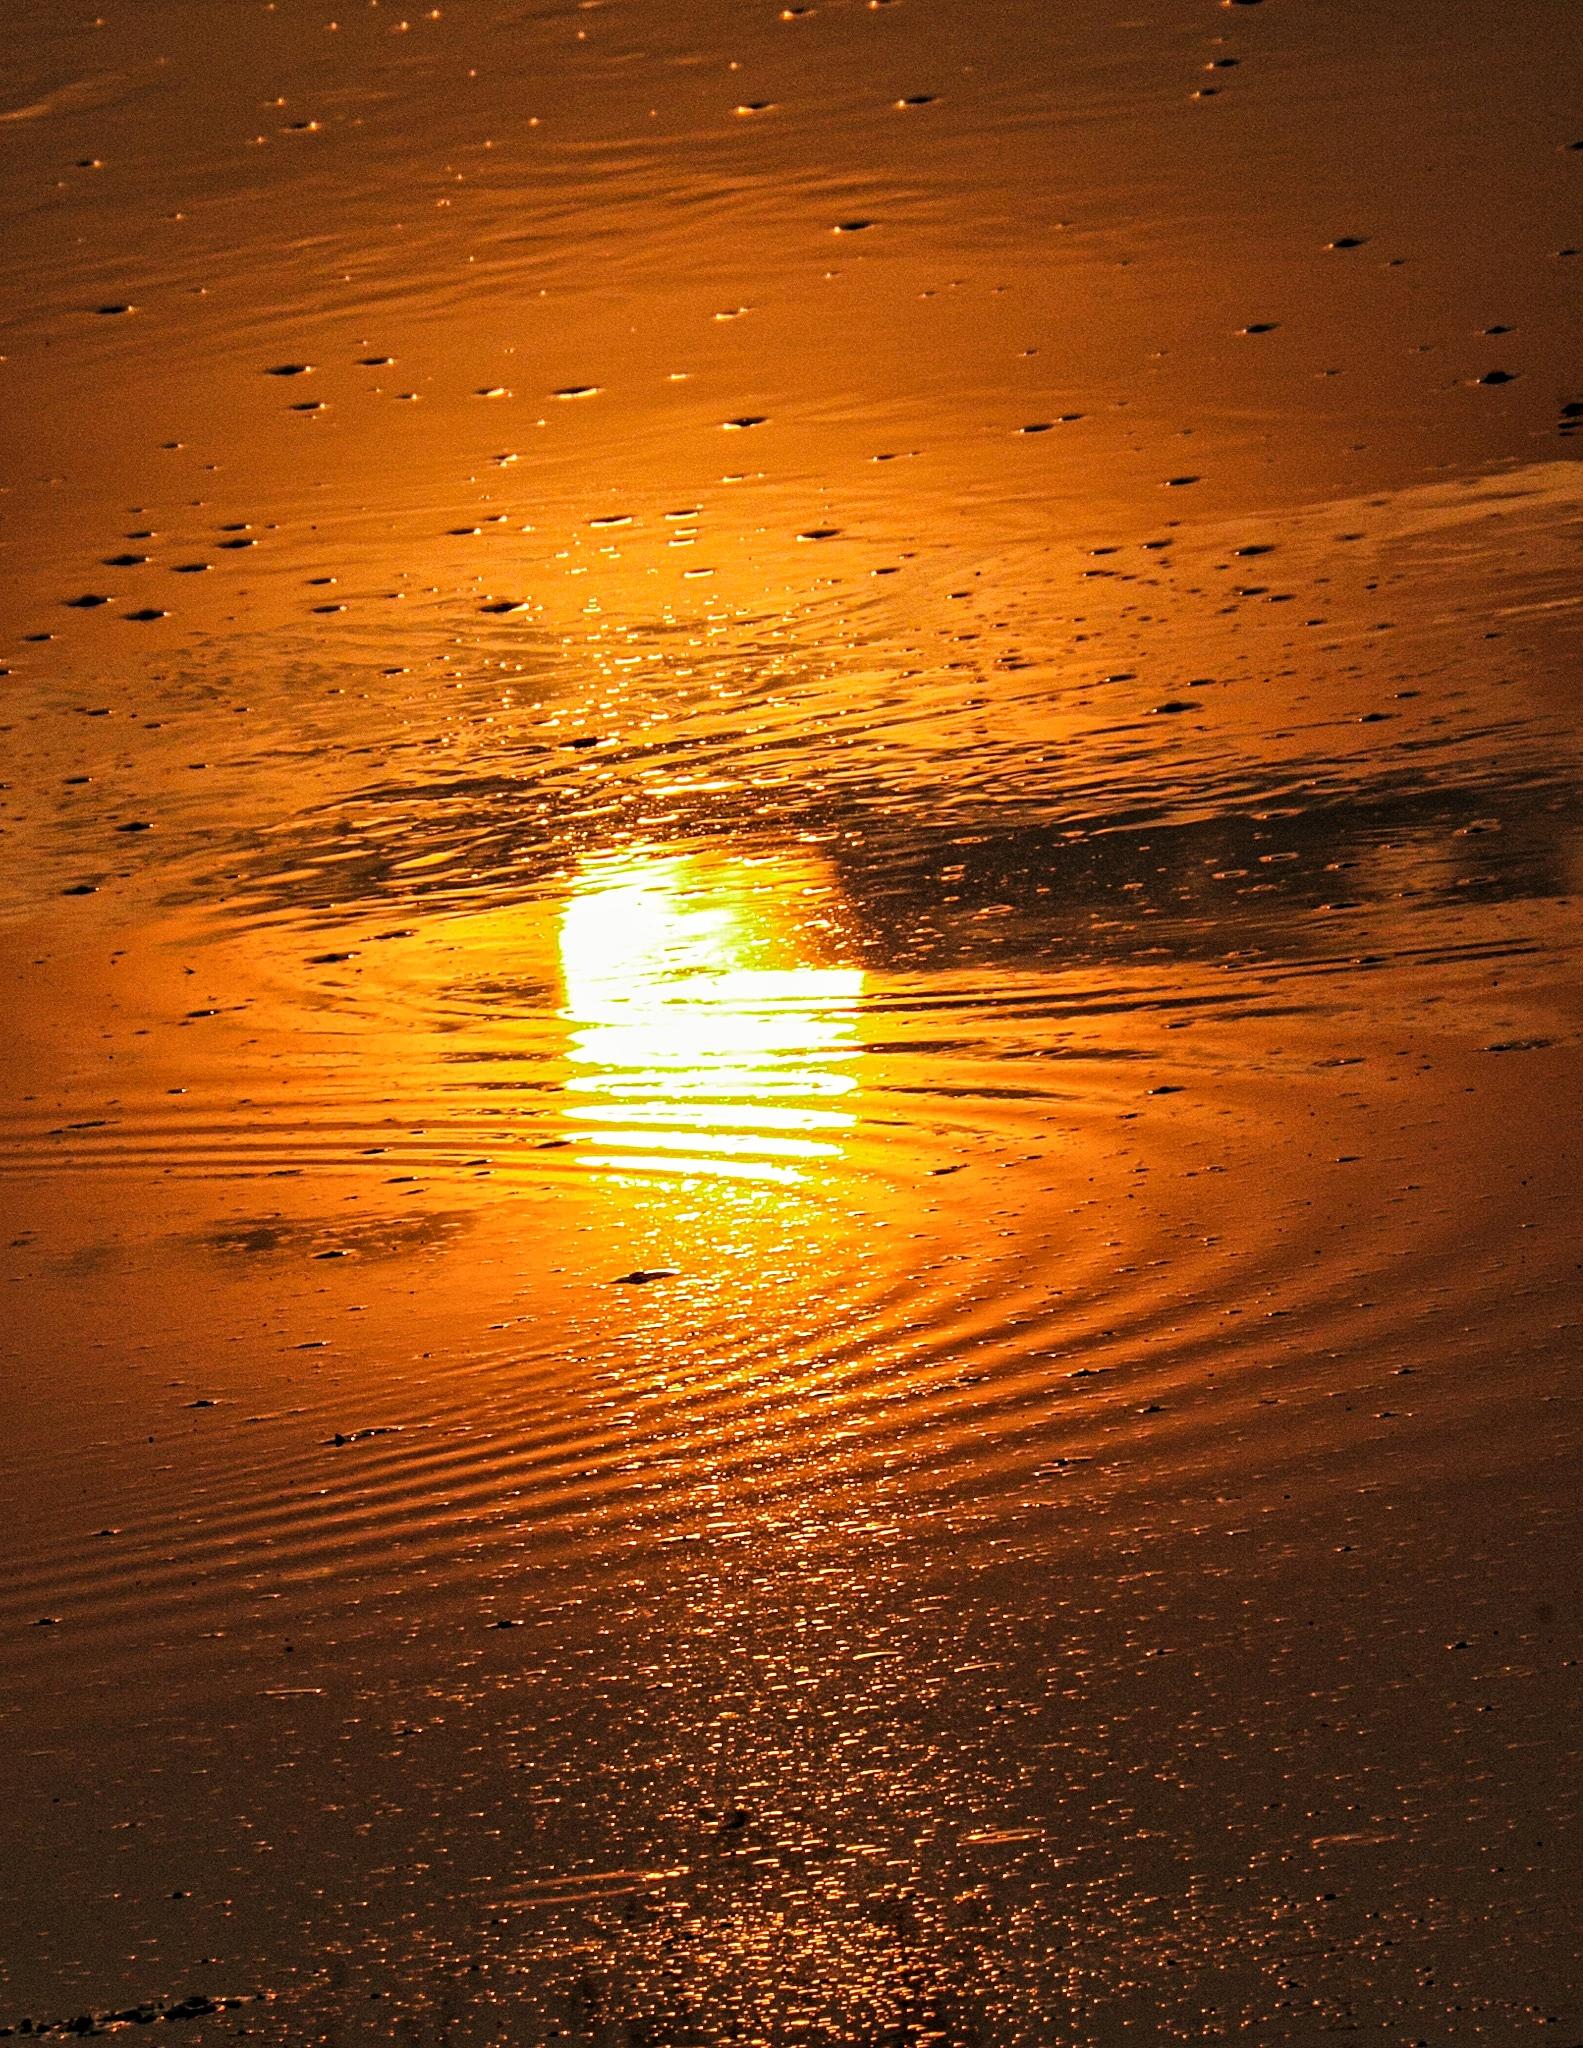 Sun reflection in water